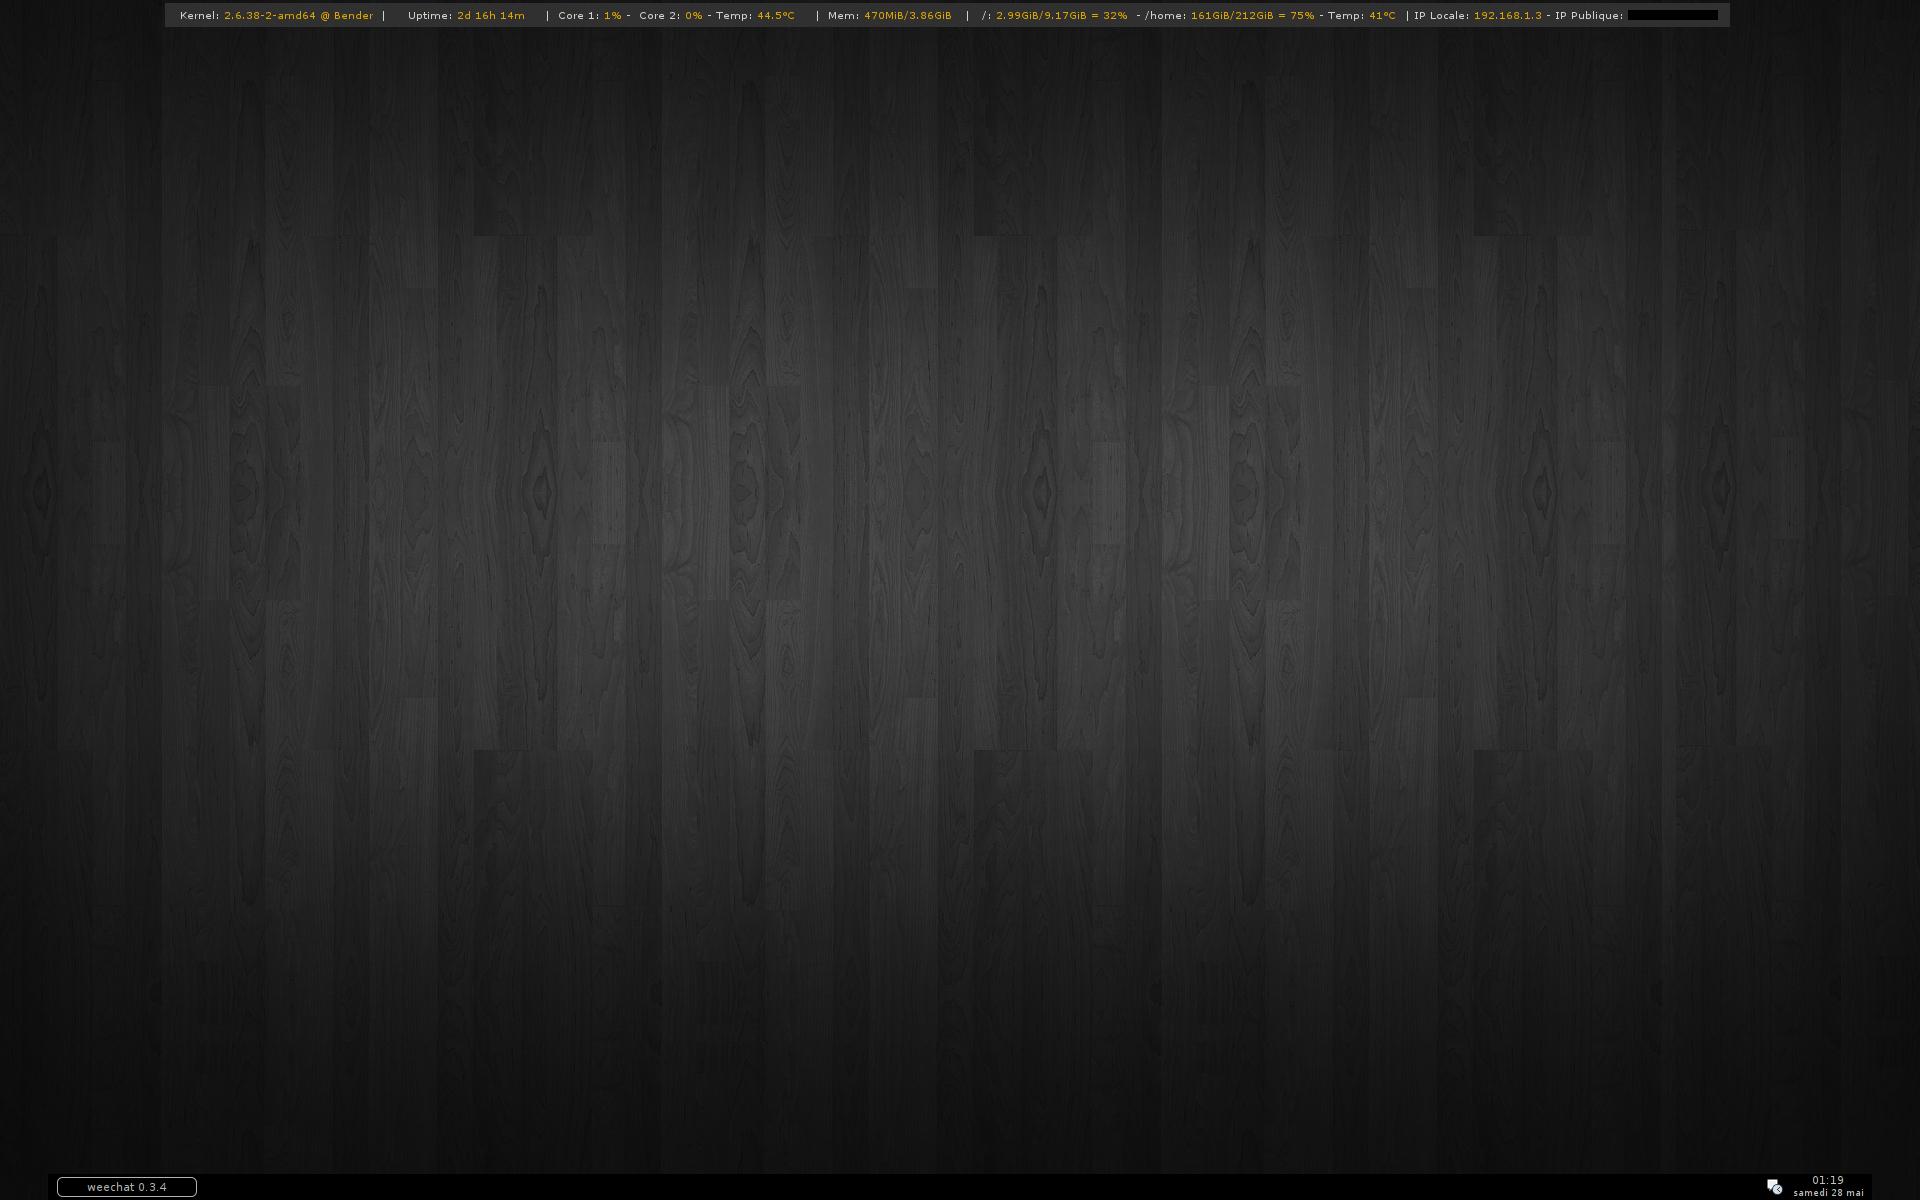 minimalist desktop wallpaper wood - photo #4